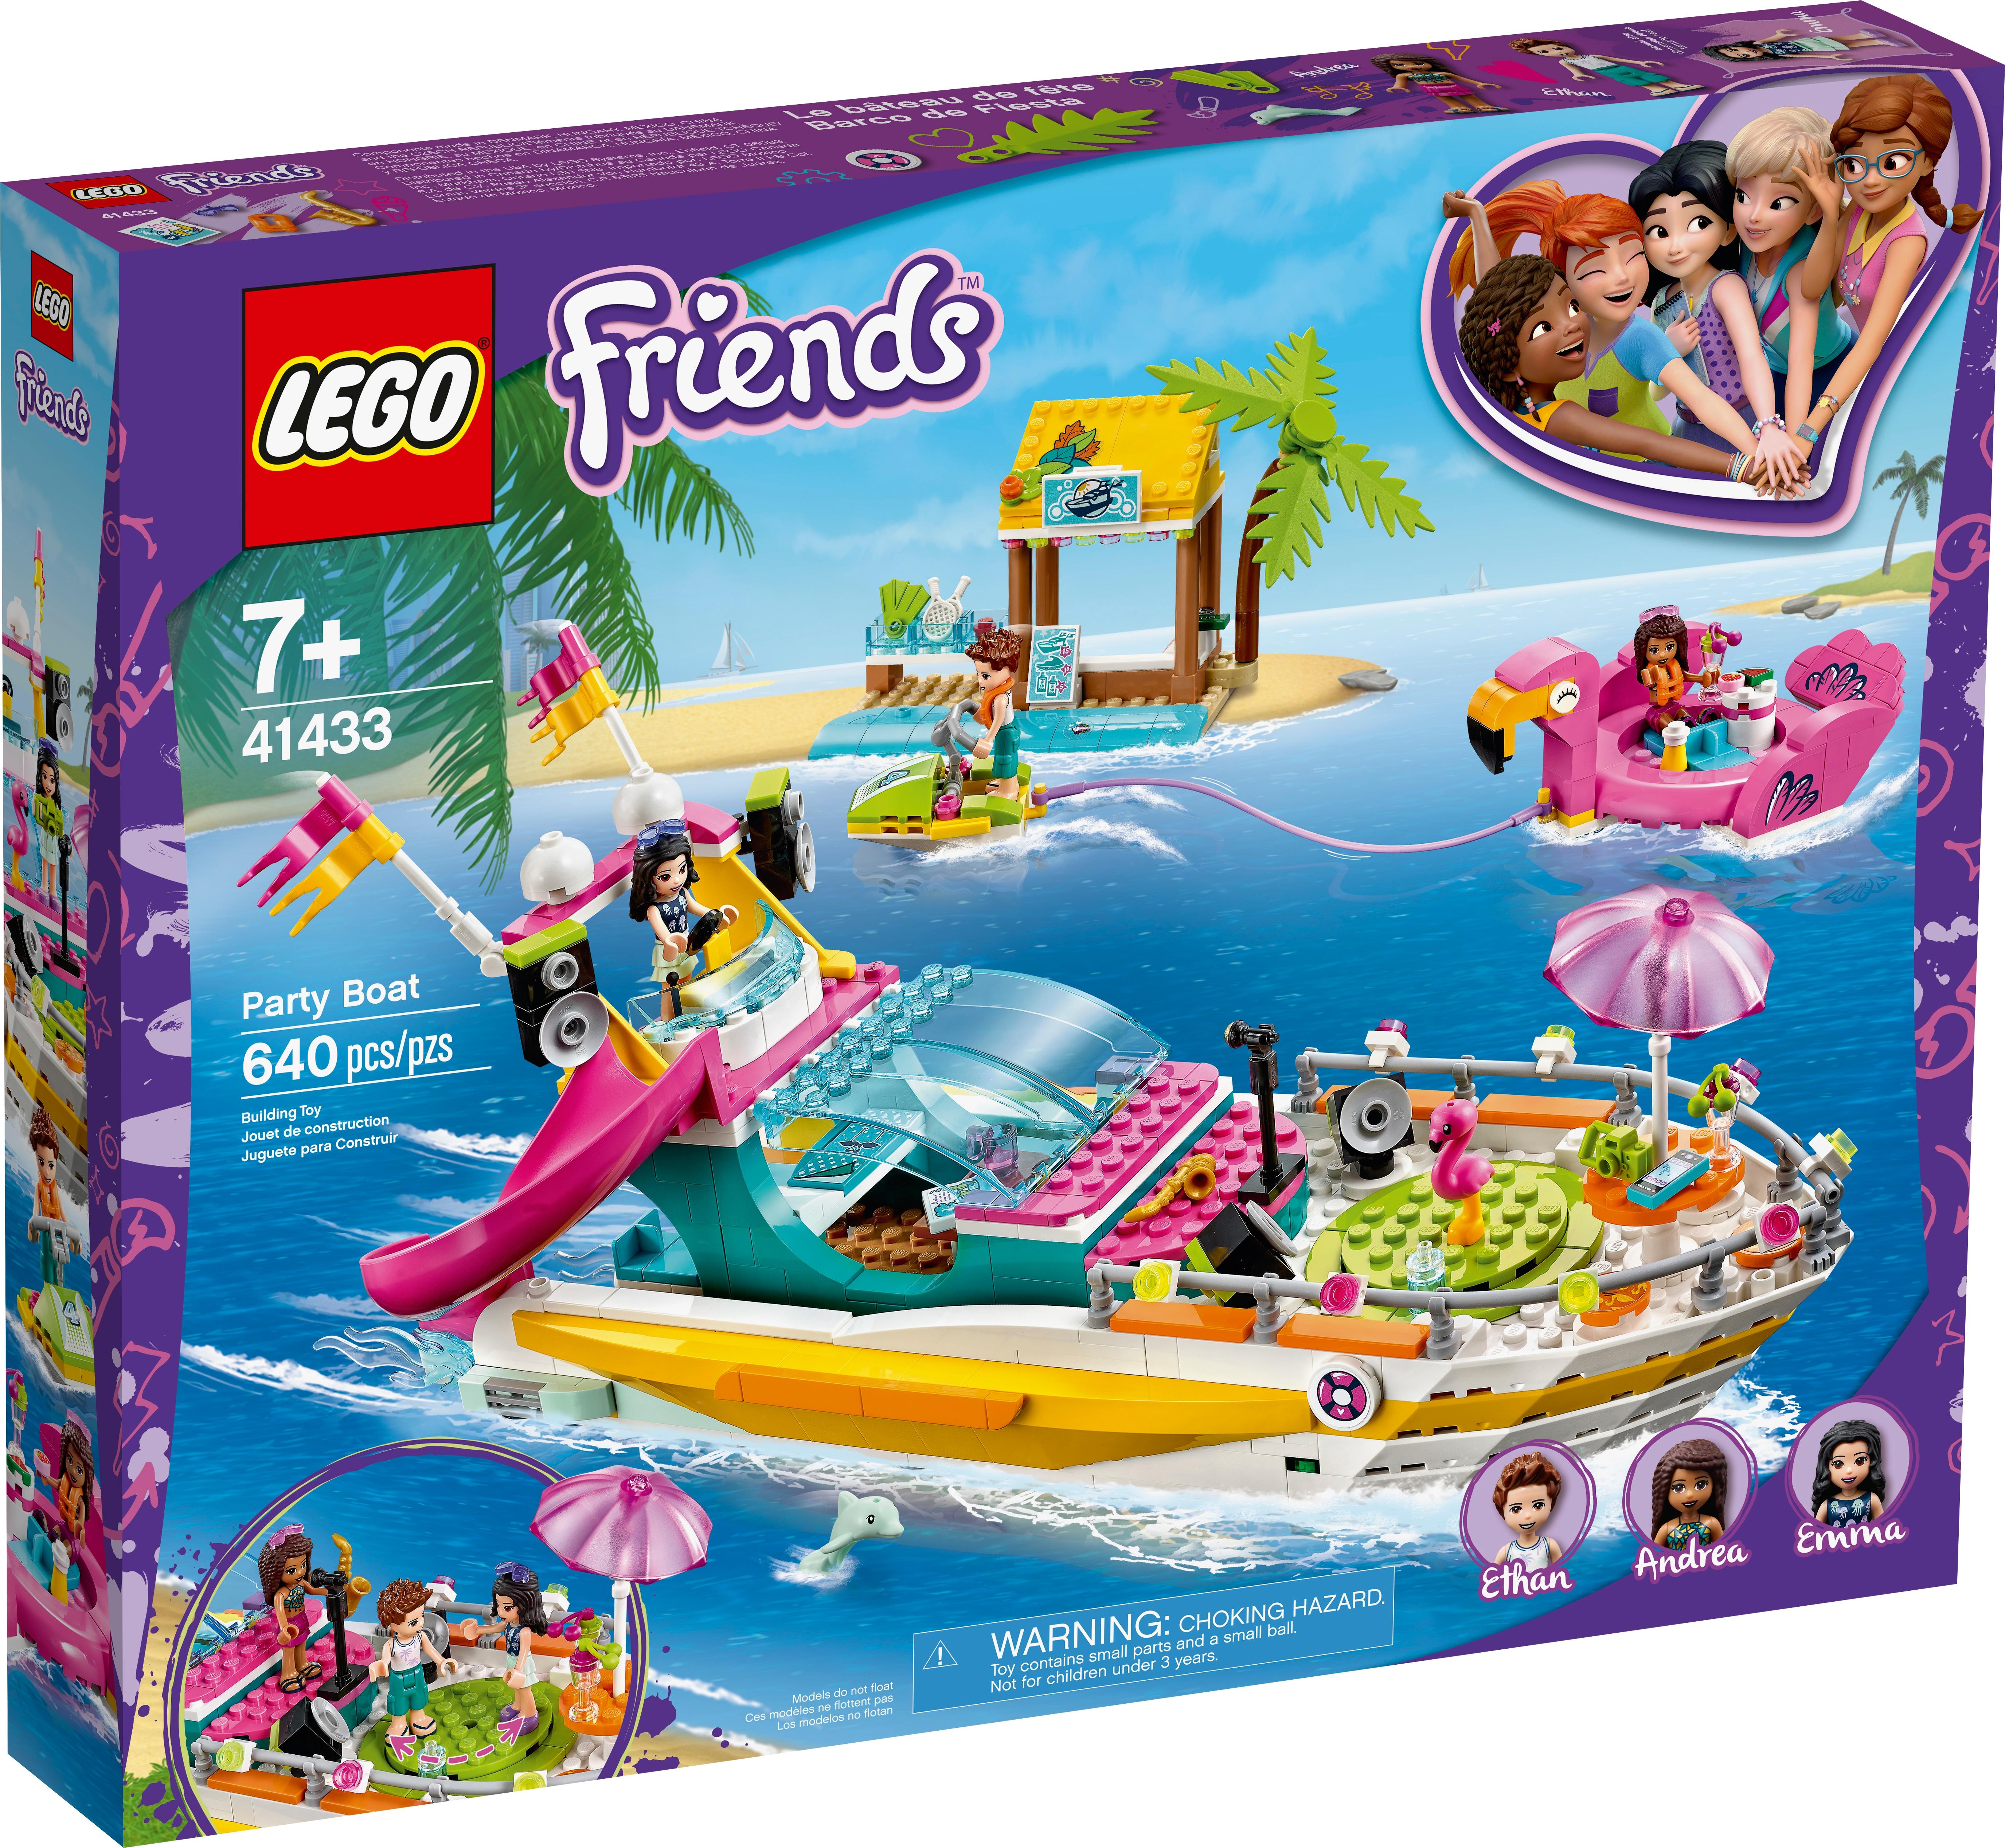 Lego Friends 41111 | Lego friends party, Lego friends, Lego